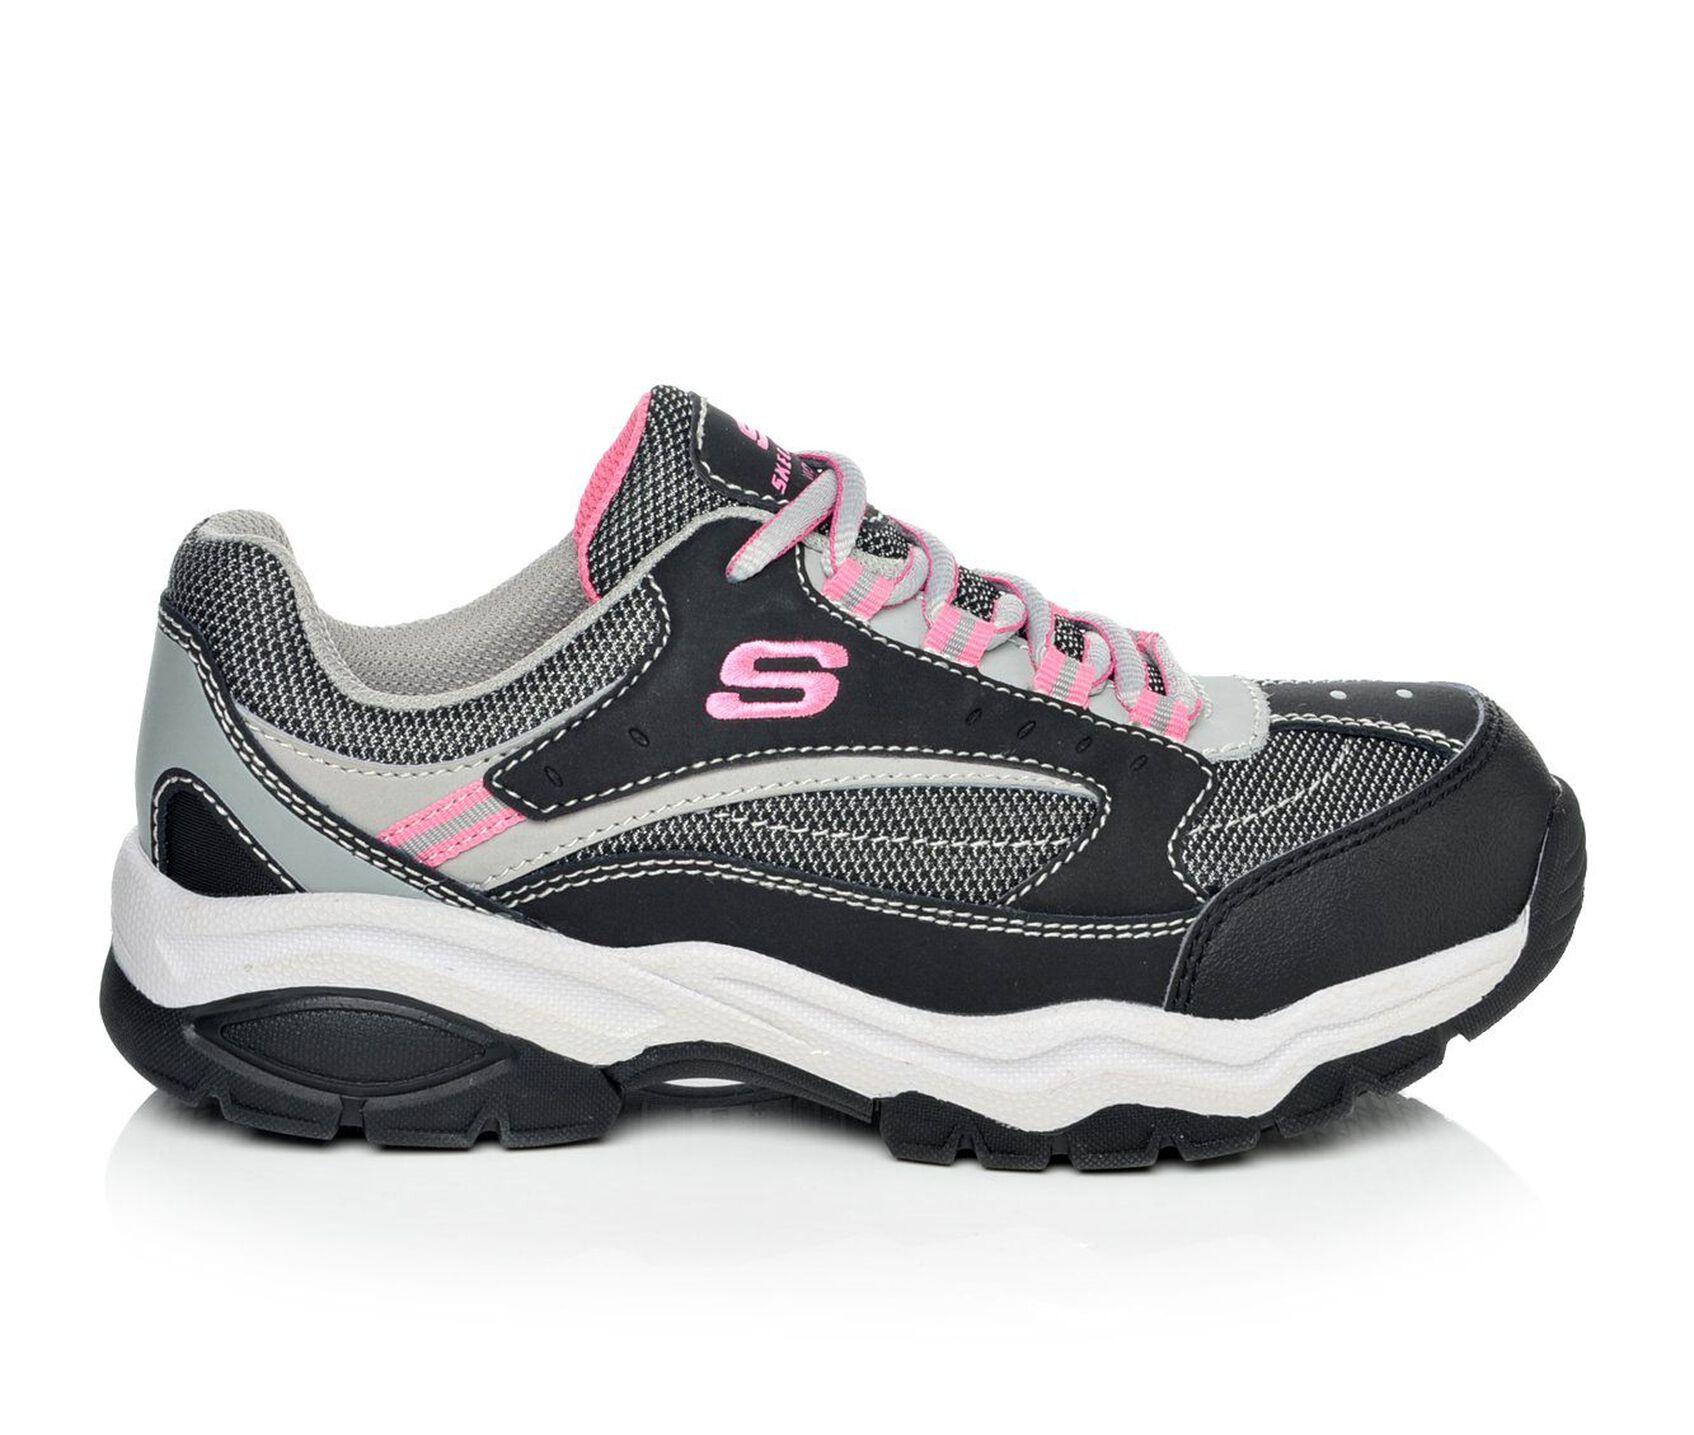 2f6ccb629ae8 Women s Skechers Work 76601 Biscoe Steel Toe Work Shoes